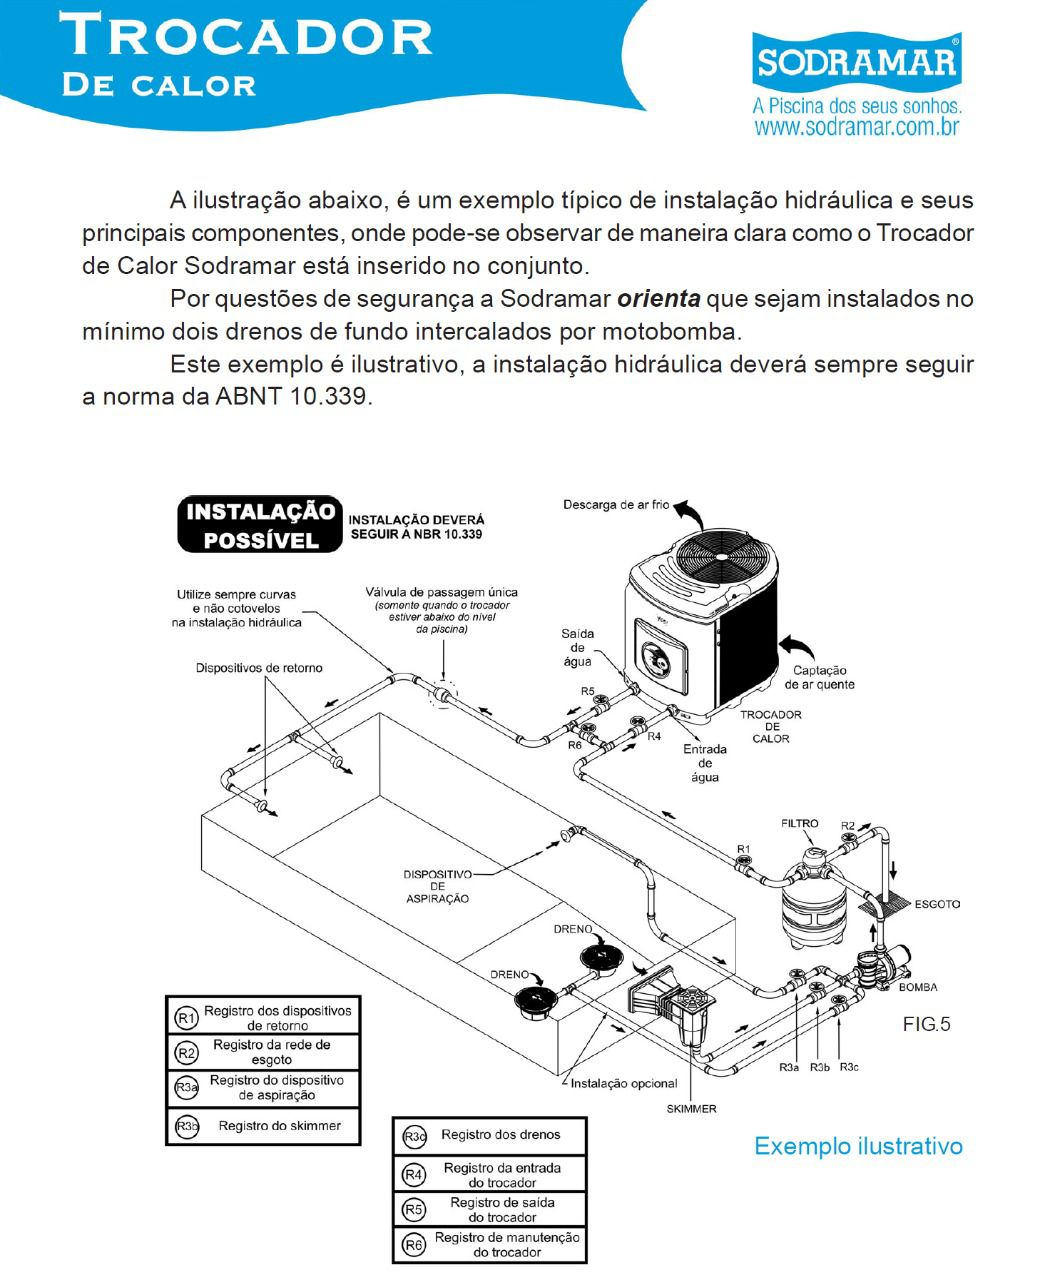 Aquecedor de piscina Sodramar Yes - Trocador de Calor Sd-130 Trif 220V